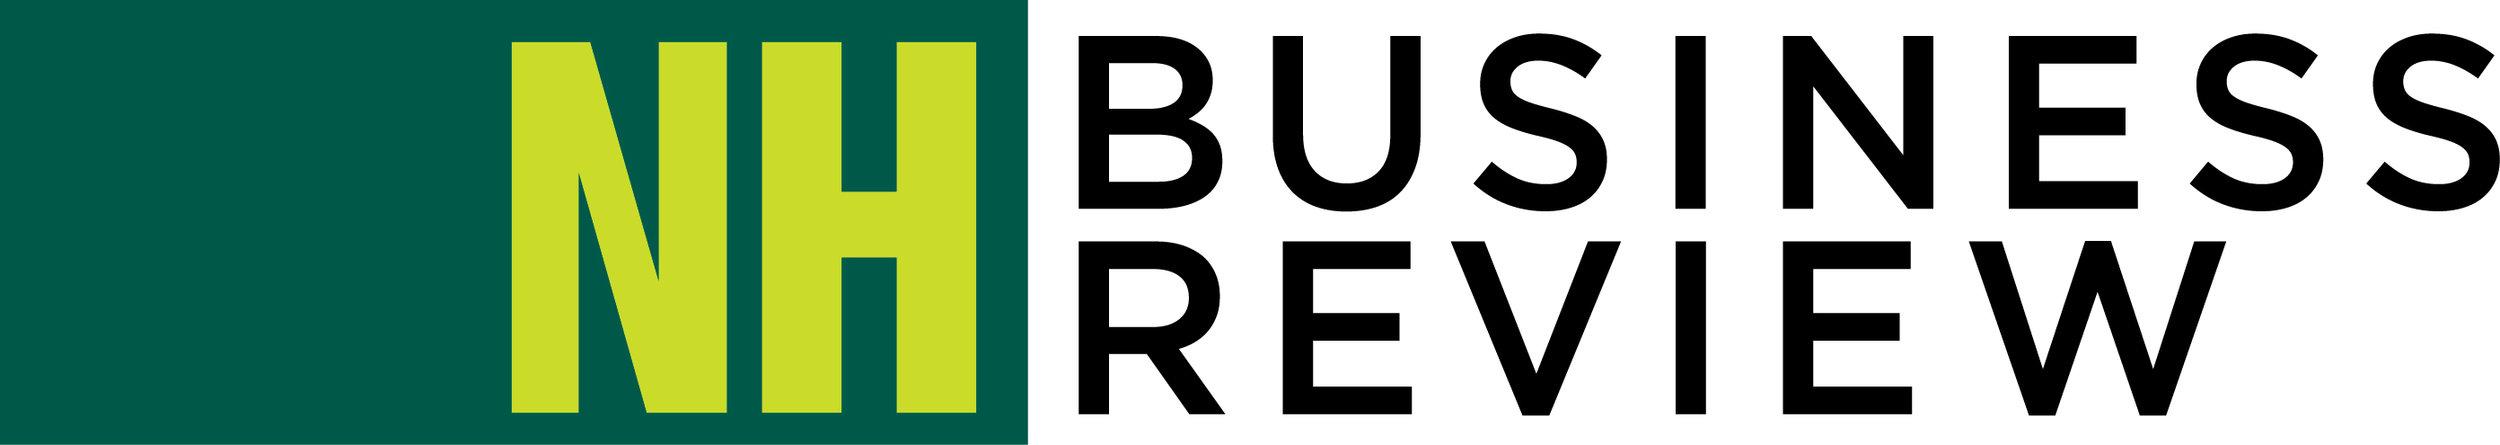 nhbr-logo-2015-RGB.jpg